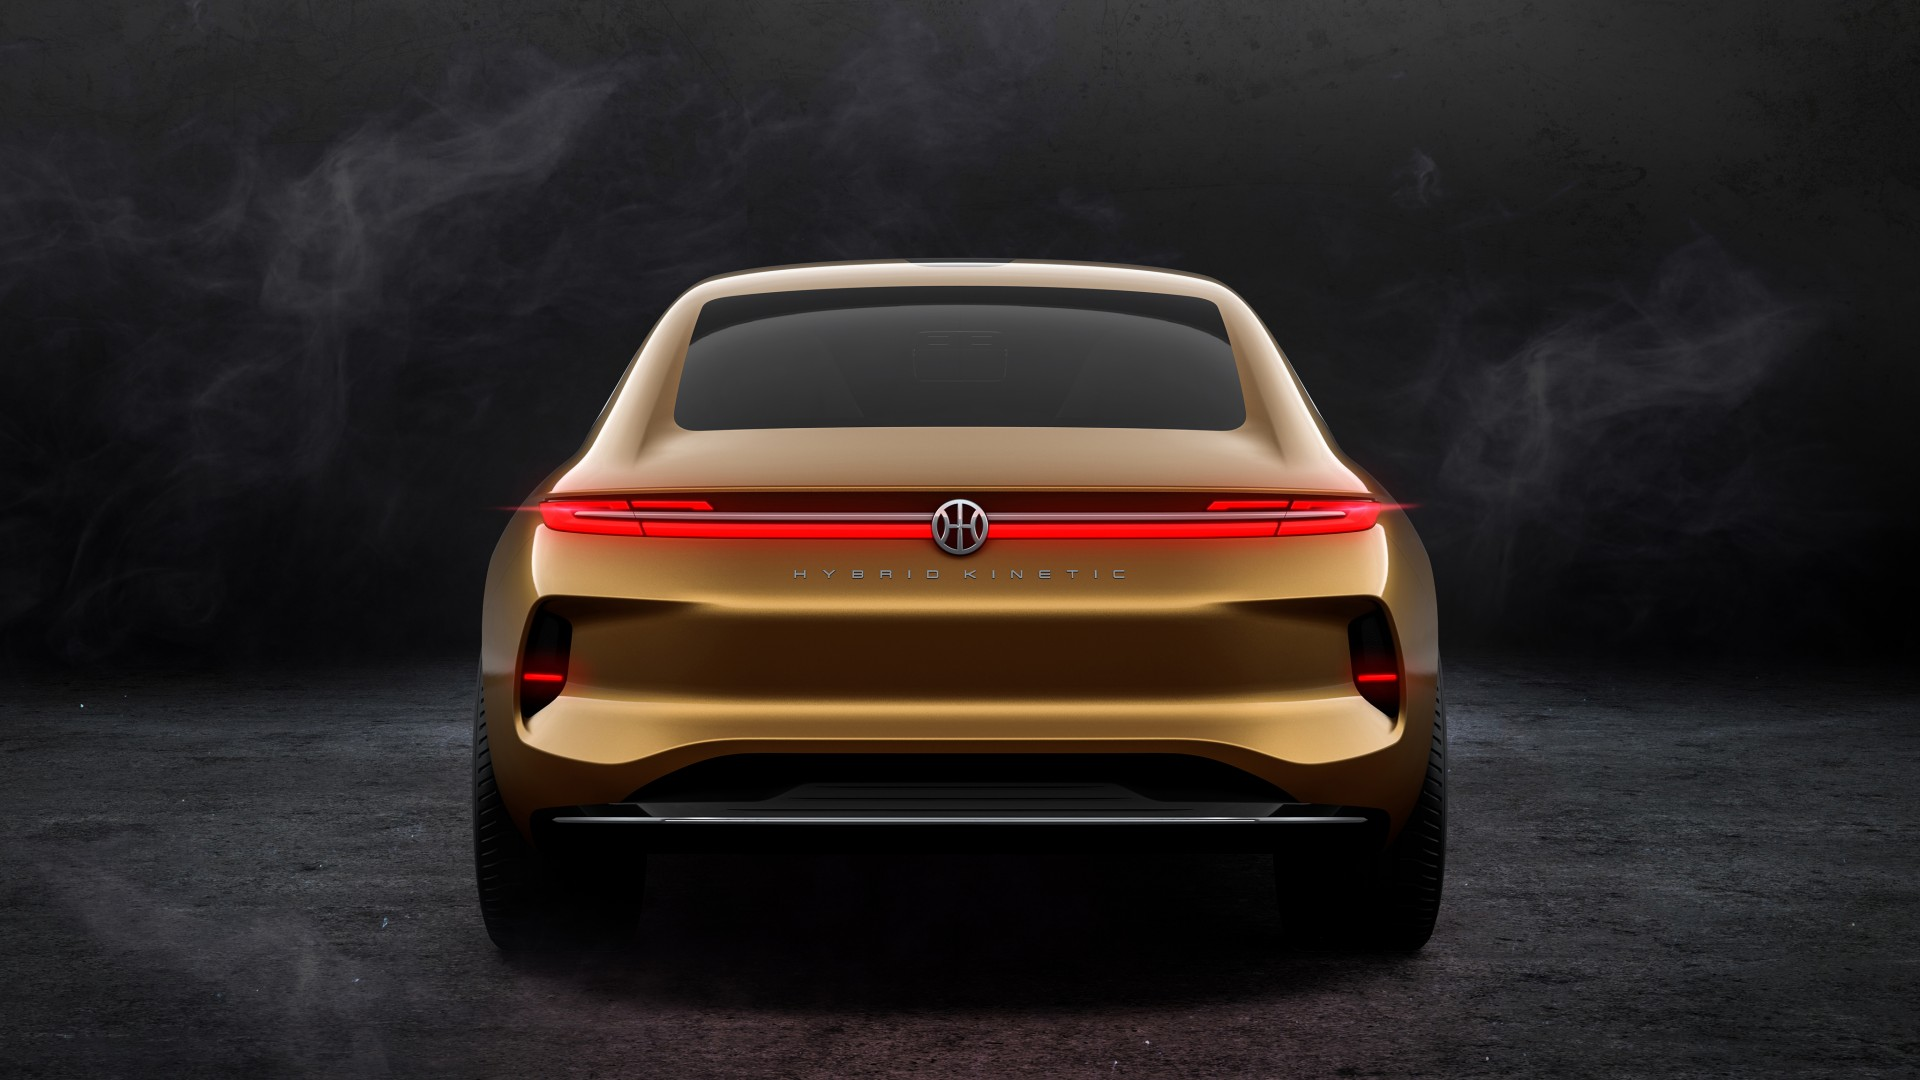 Hybrid Kinetic H500 2018 4K 2 Wallpaper | HD Car ...